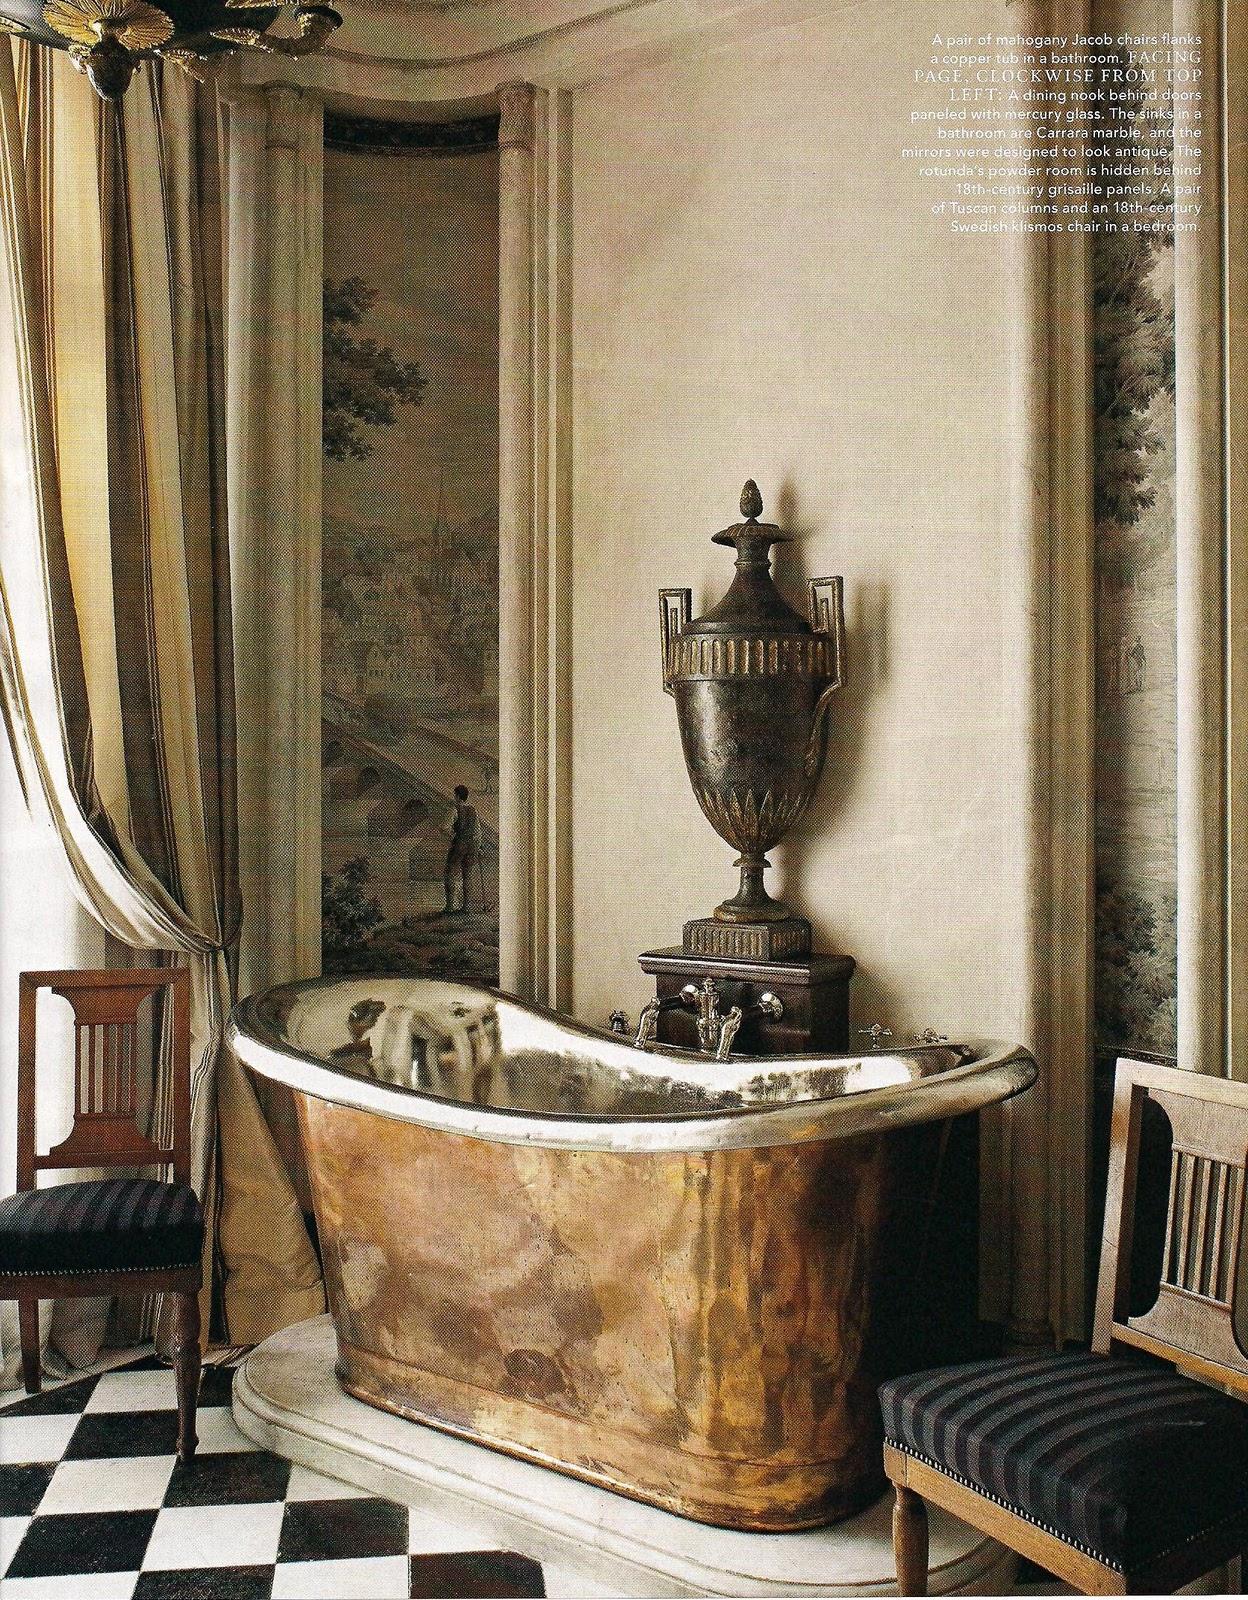 Paris Style Bathroom Decor: Renée Finberg ' TELLS ALL ' In Her Blog Of Her Adventures